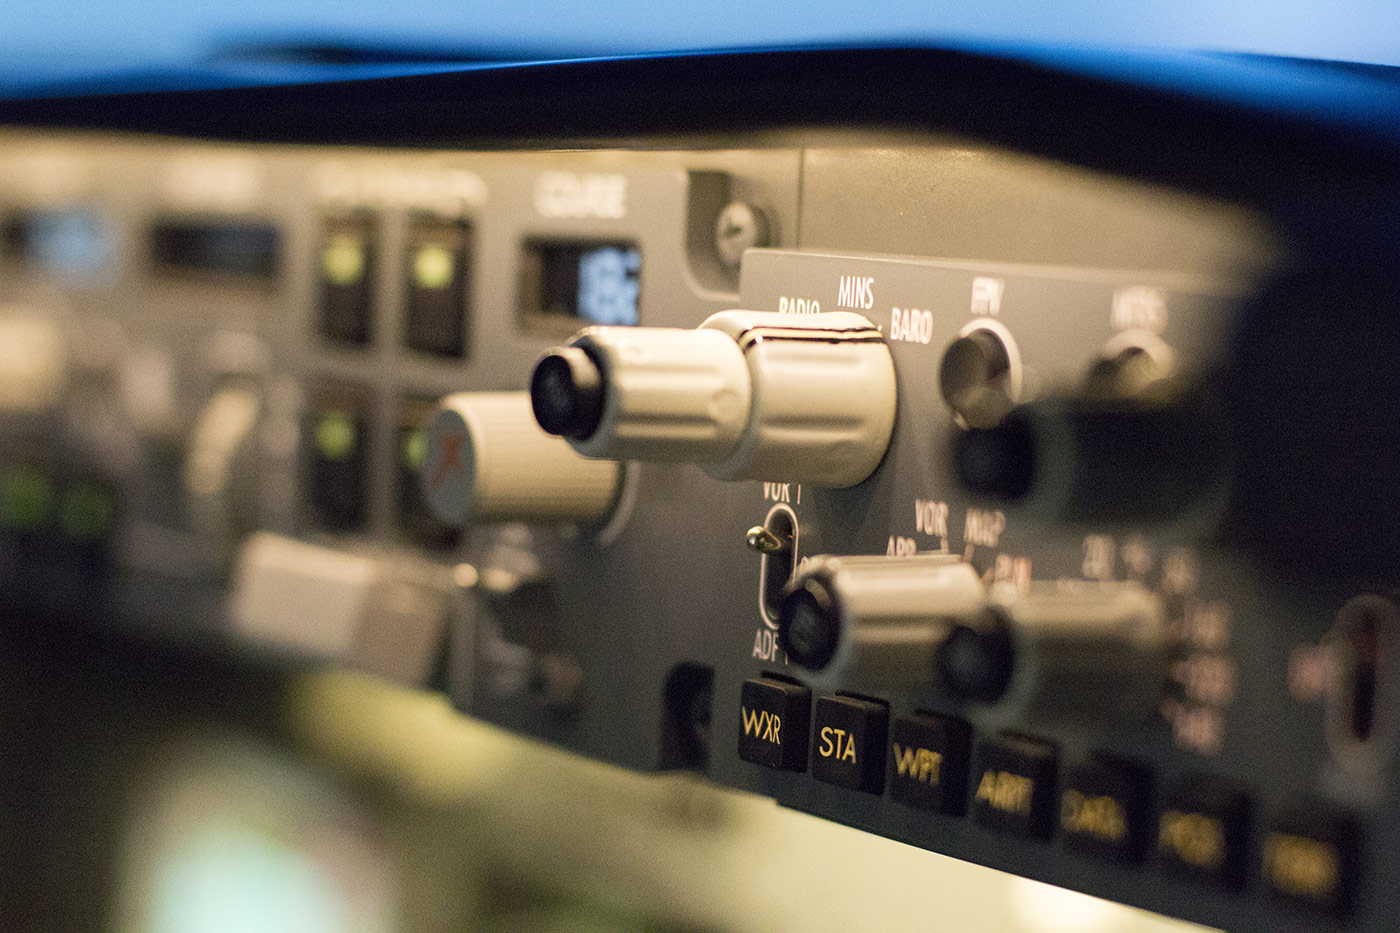 Radio altimeter and auto pilot on the instrument panel